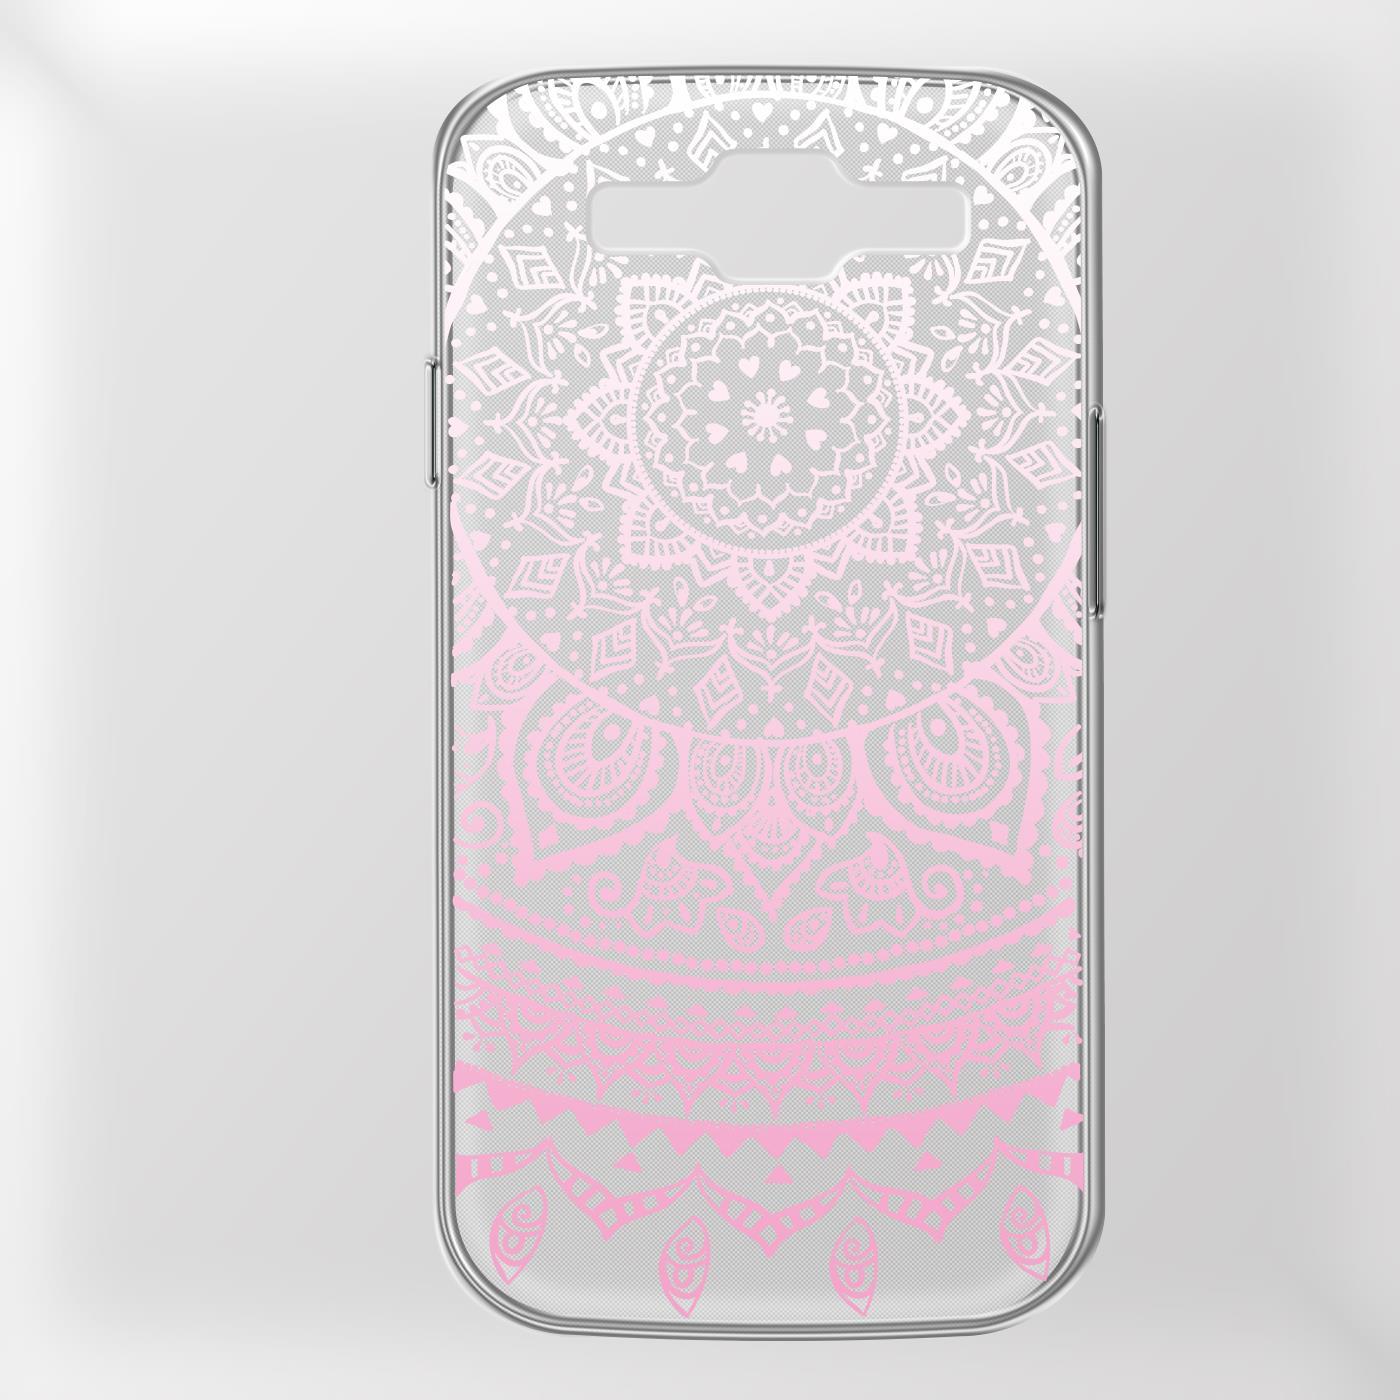 Samsung-Galaxy-S3-Neo-Handy-Schutz-Huelle-Case-TPU-Silikon-Cover-Tasche-Mandala Indexbild 19